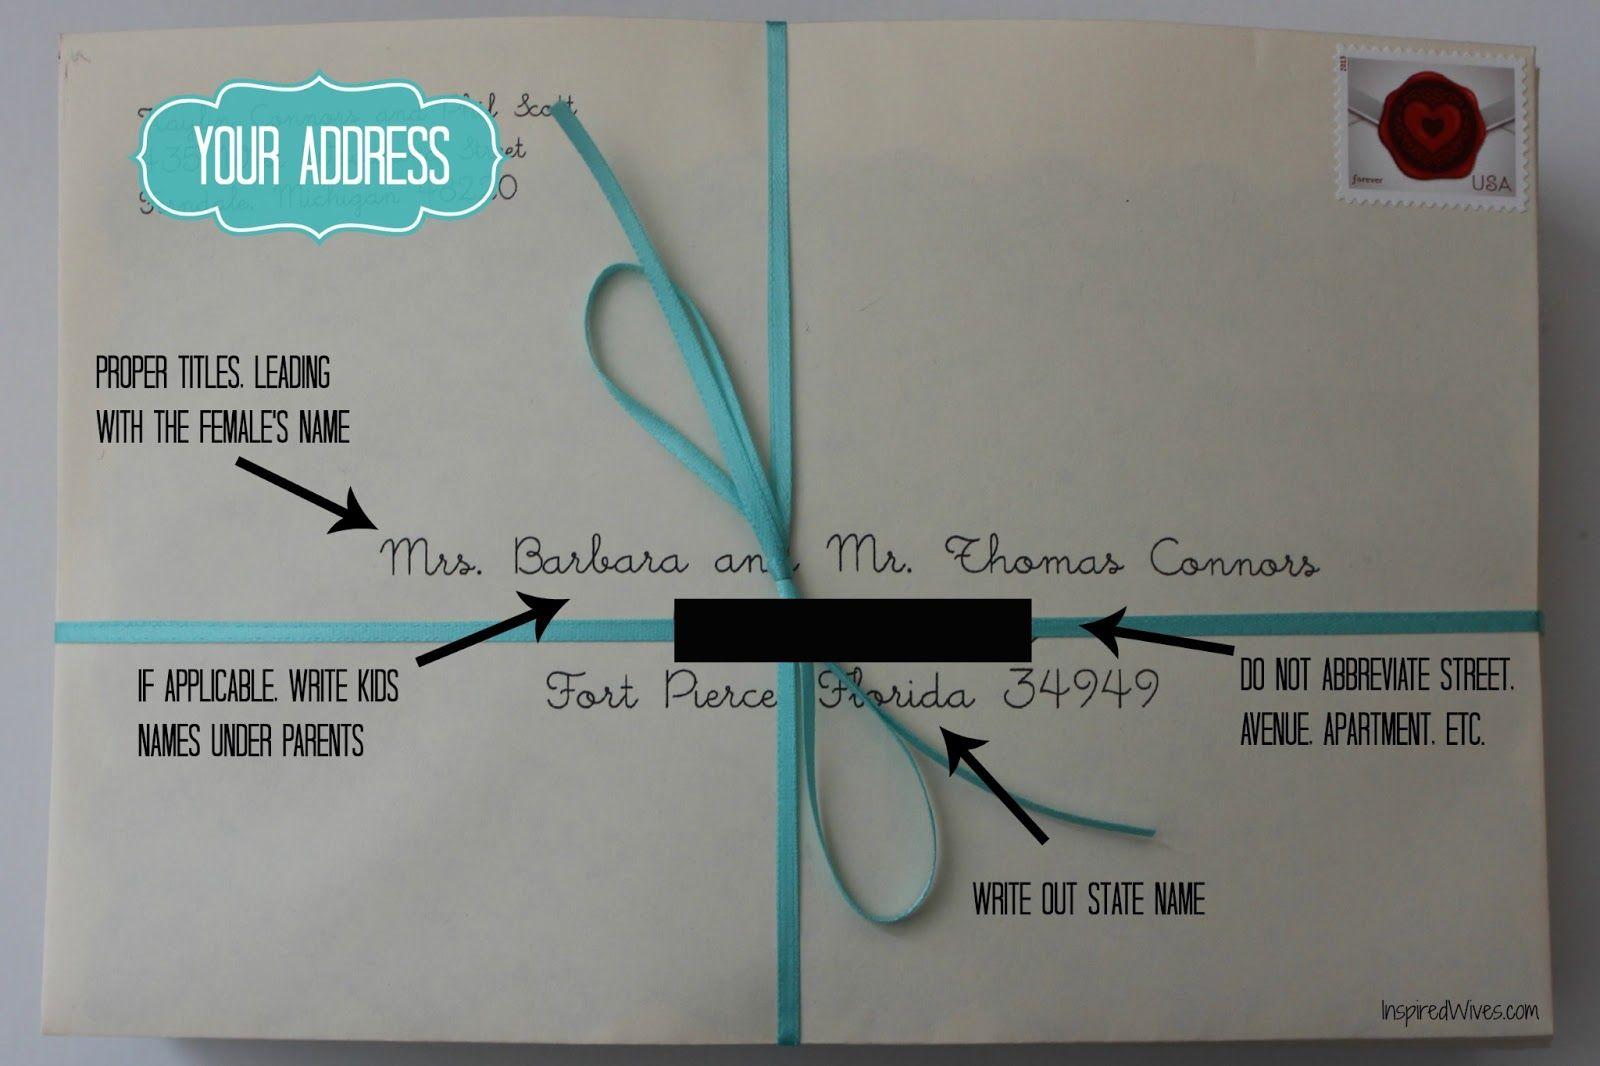 How To Address A Postcard Return Address - arxiusarquitectura